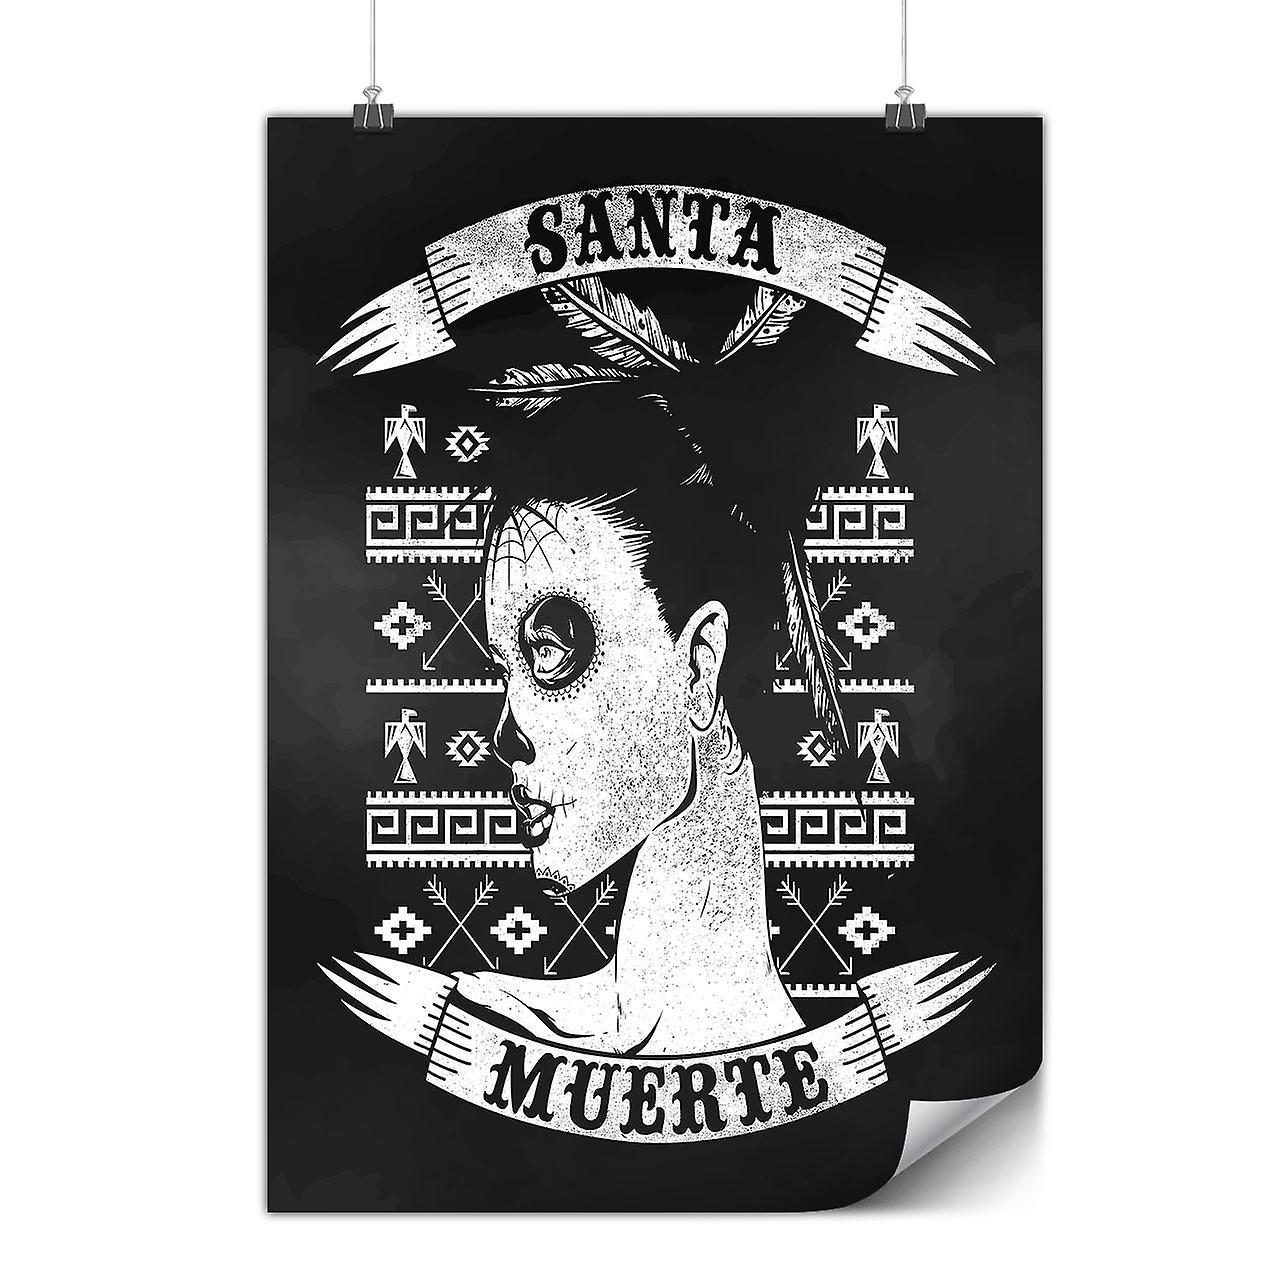 Matt Oder Glänzend Poster Mit Santa Muerte Toten Wellcoda D564